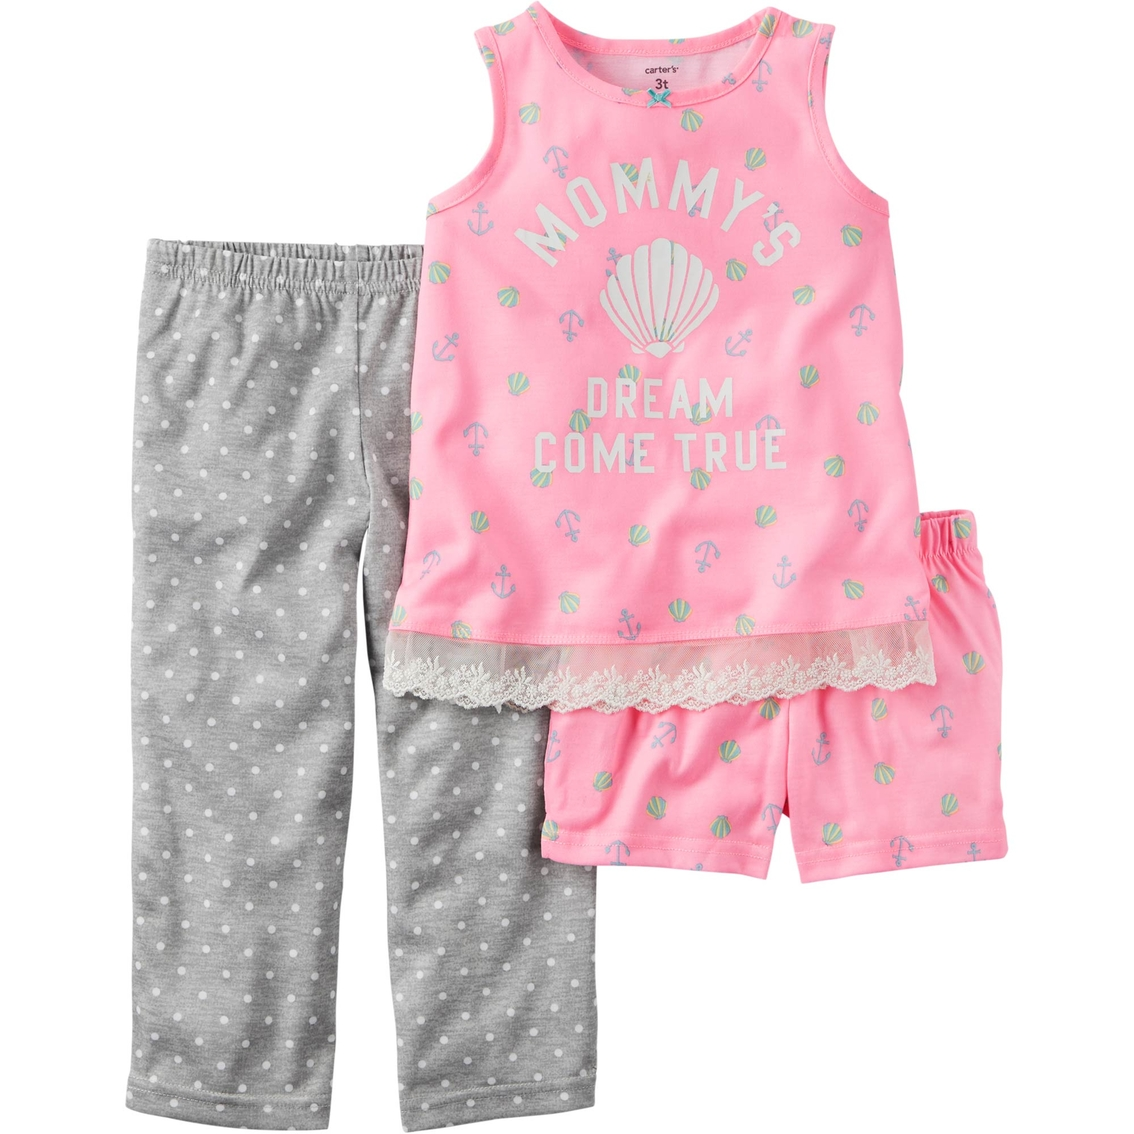 5e93025d78eb Carter s Infant Girls 3 Pc. Pajama Set